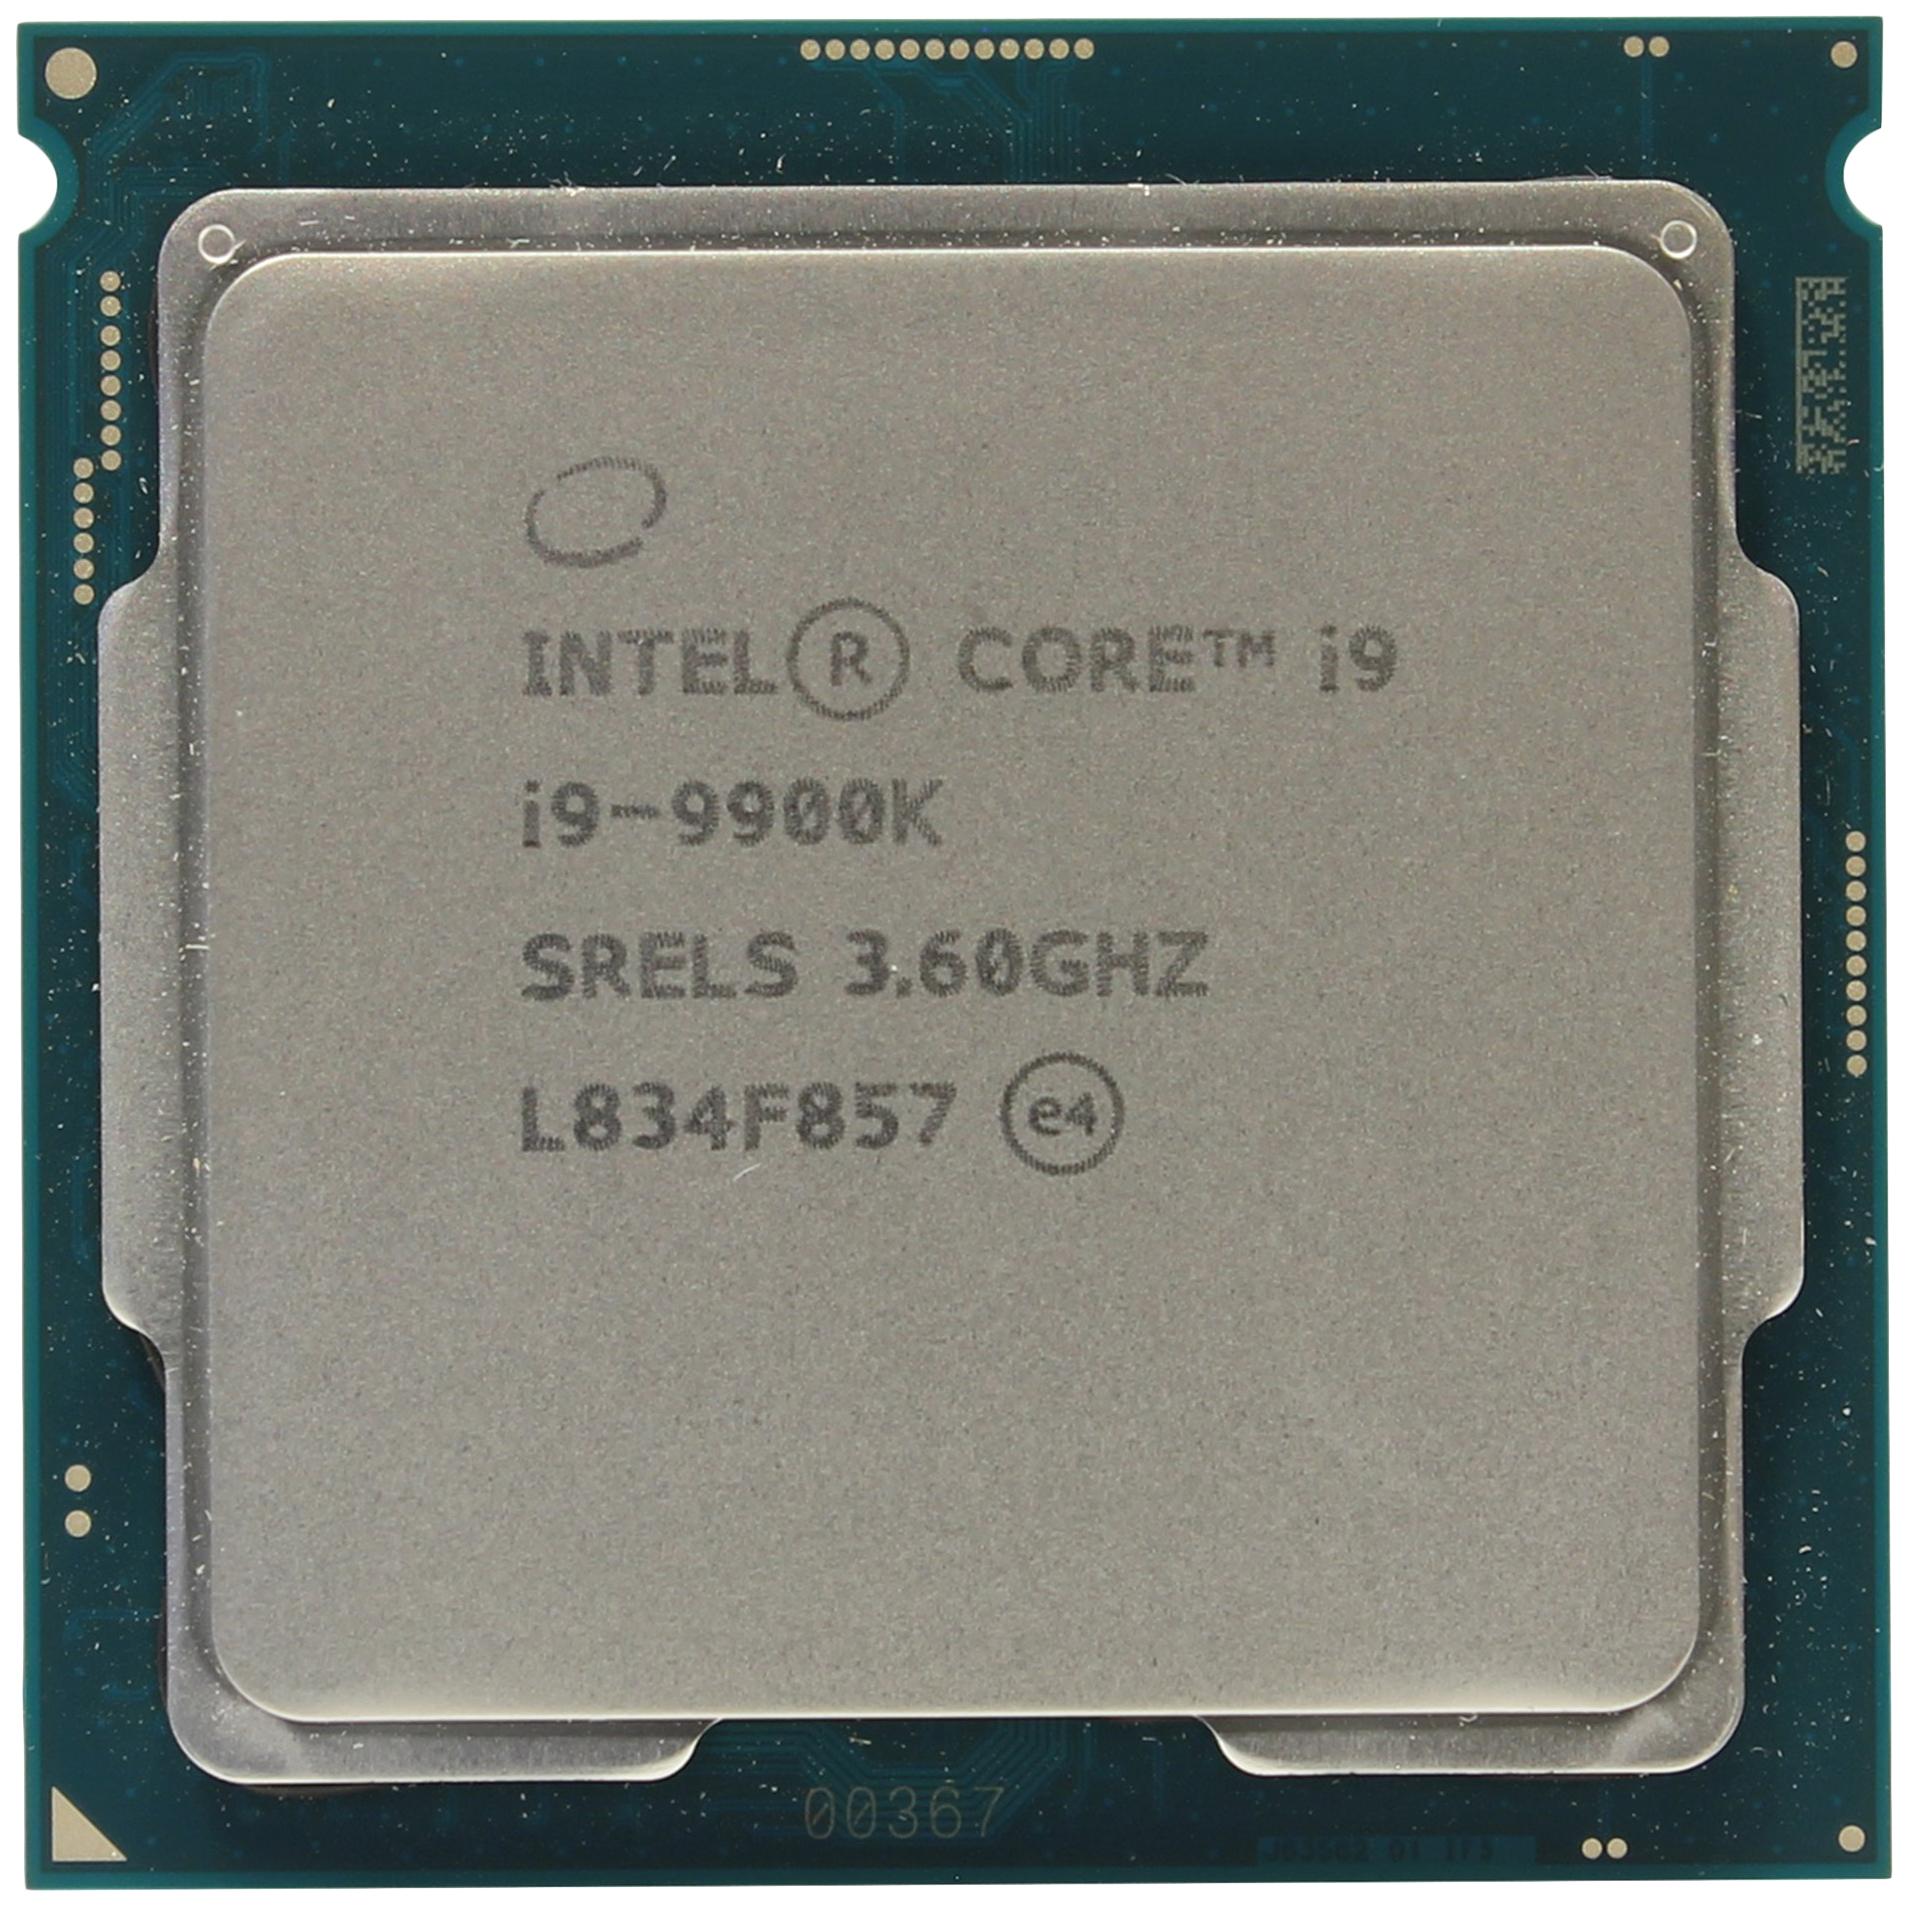 INTEL CORE I9-9900K COFFEE LAKE (3600MHZ, LGA1151 V2, L3 16386KB) (OEM)